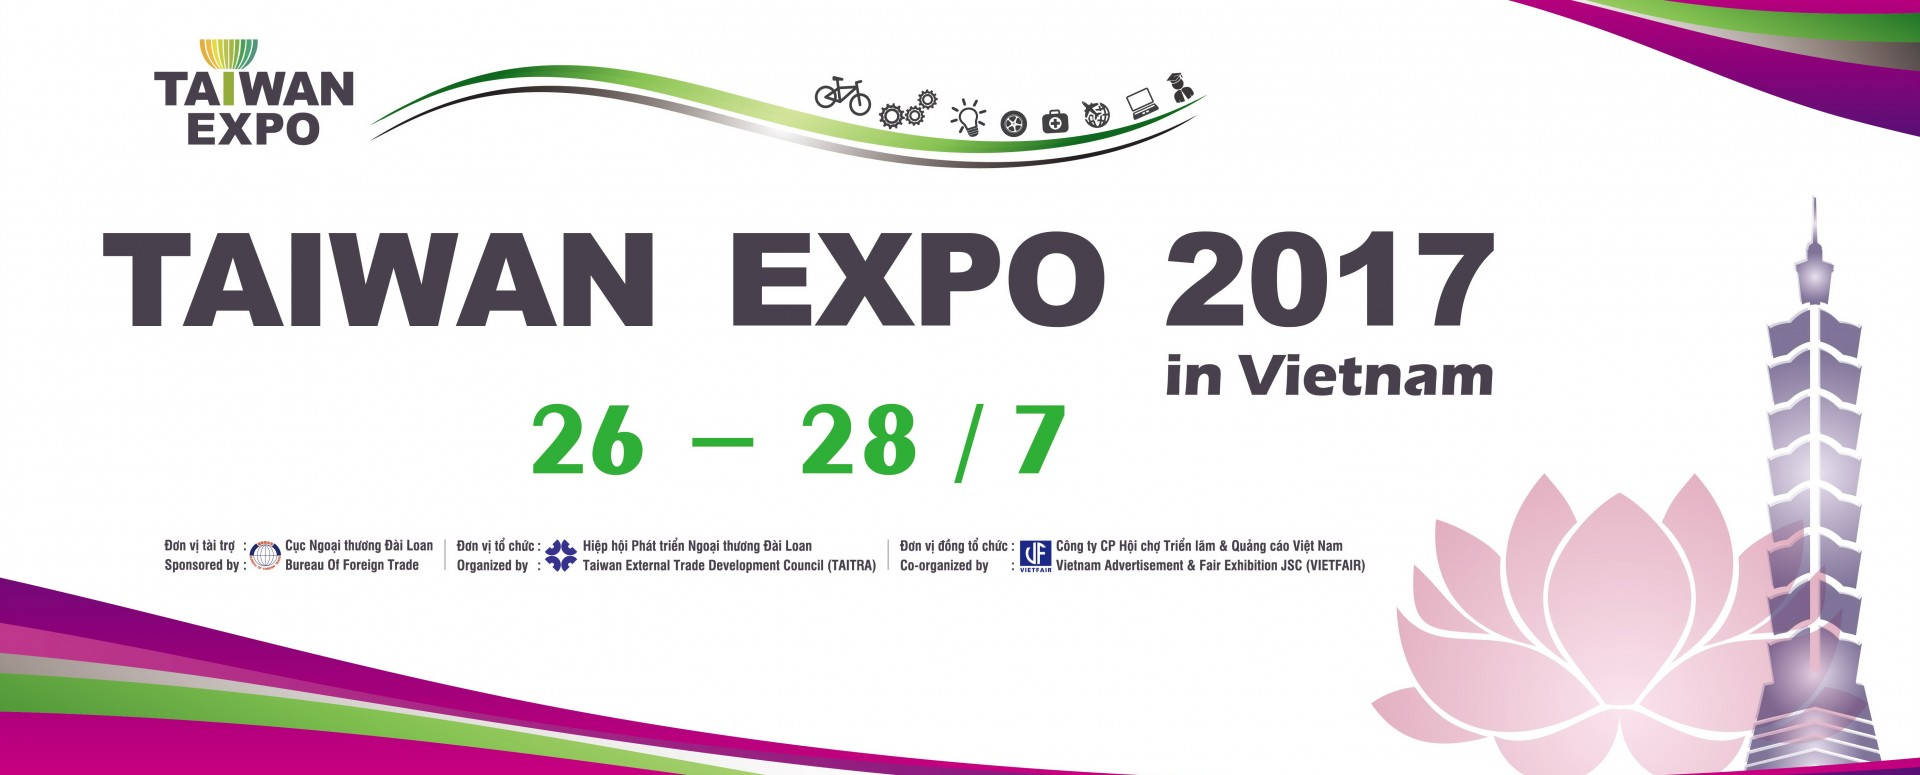 TAIWAN EXPO 2017